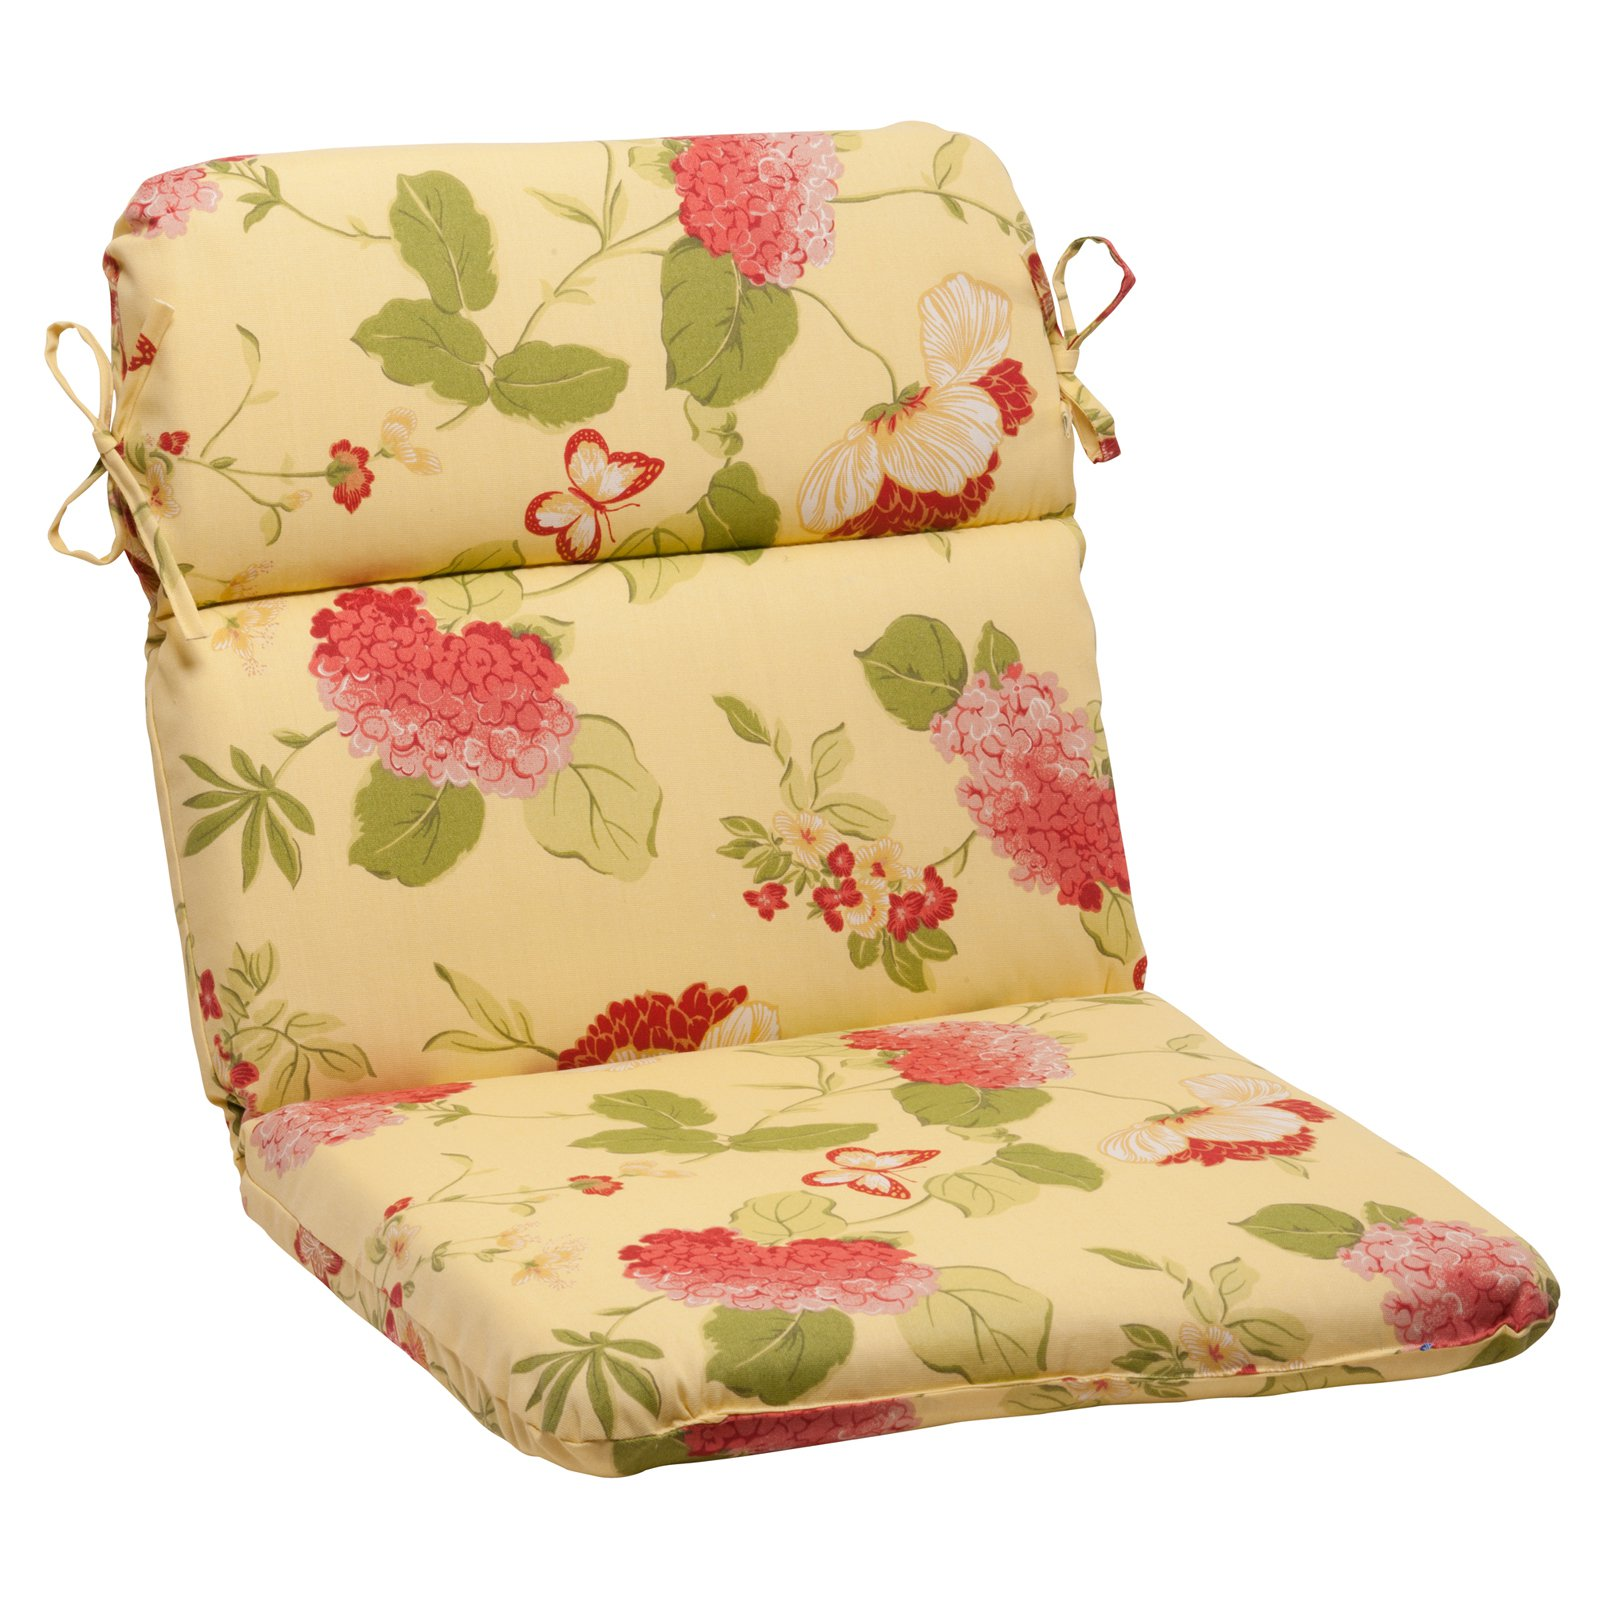 Pillow Perfect Risa Lemonade Rounded Corners Hinged Chair Cushion Walmart Com Walmart Com